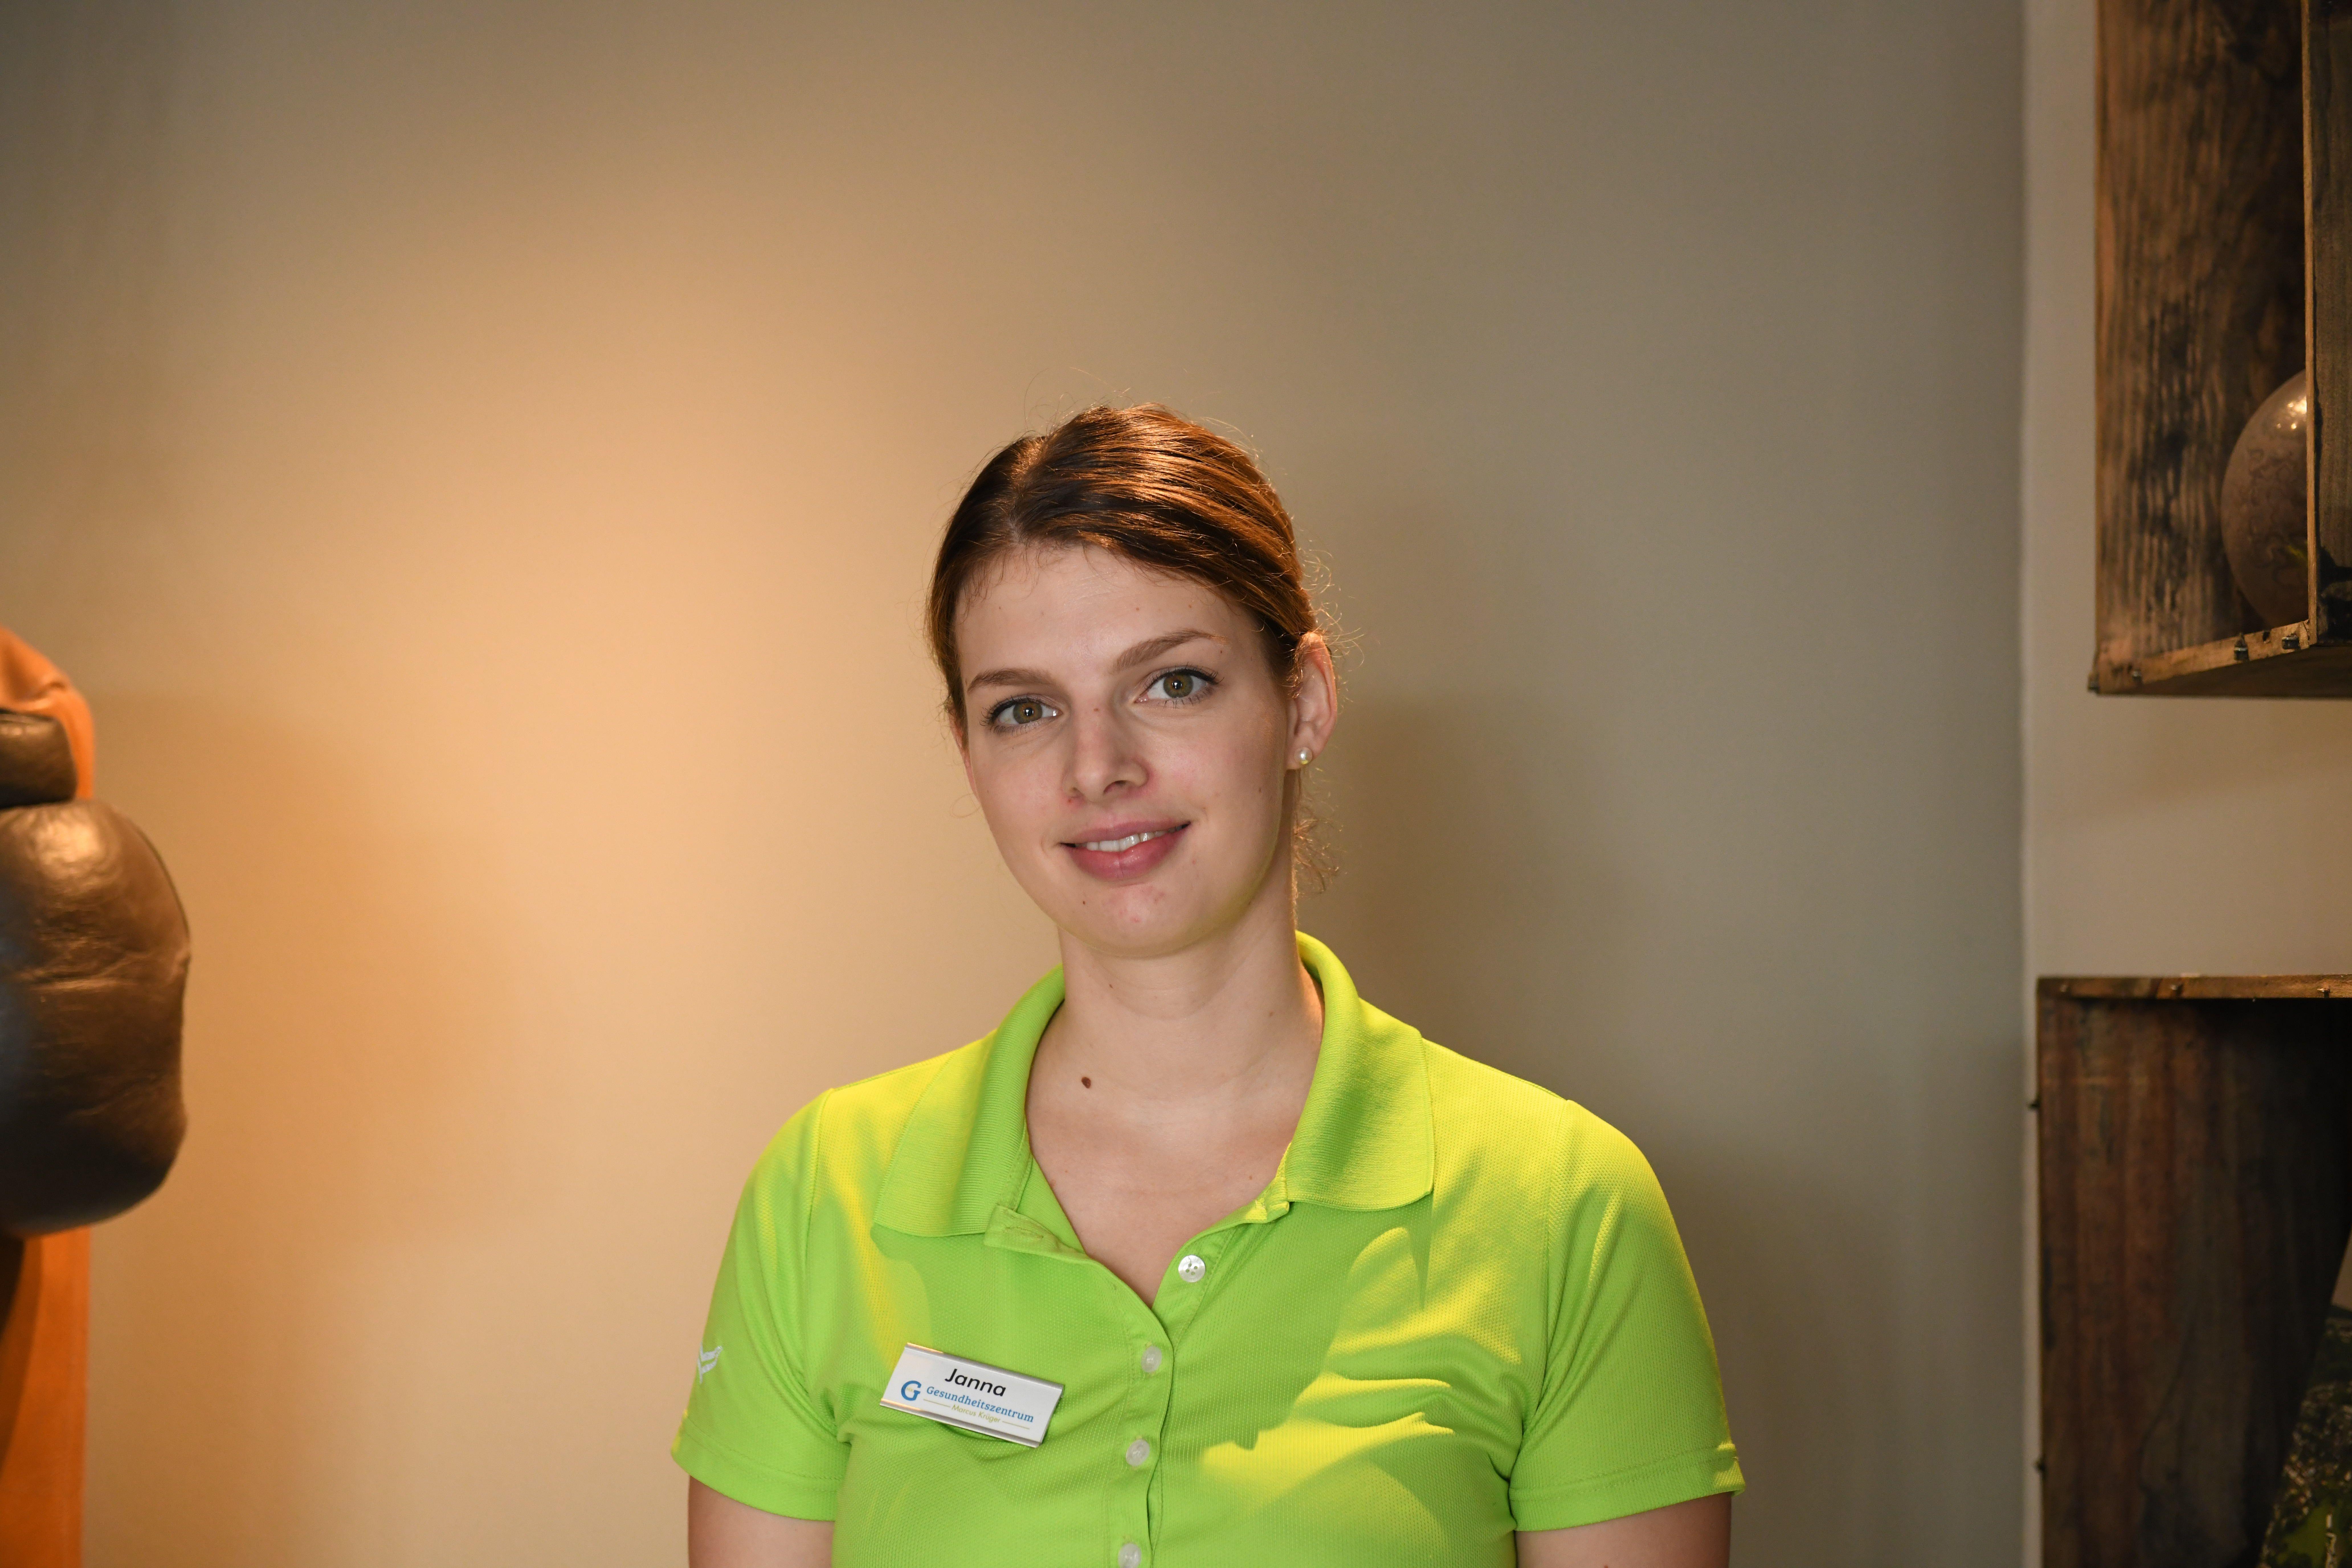 Janna Klüver